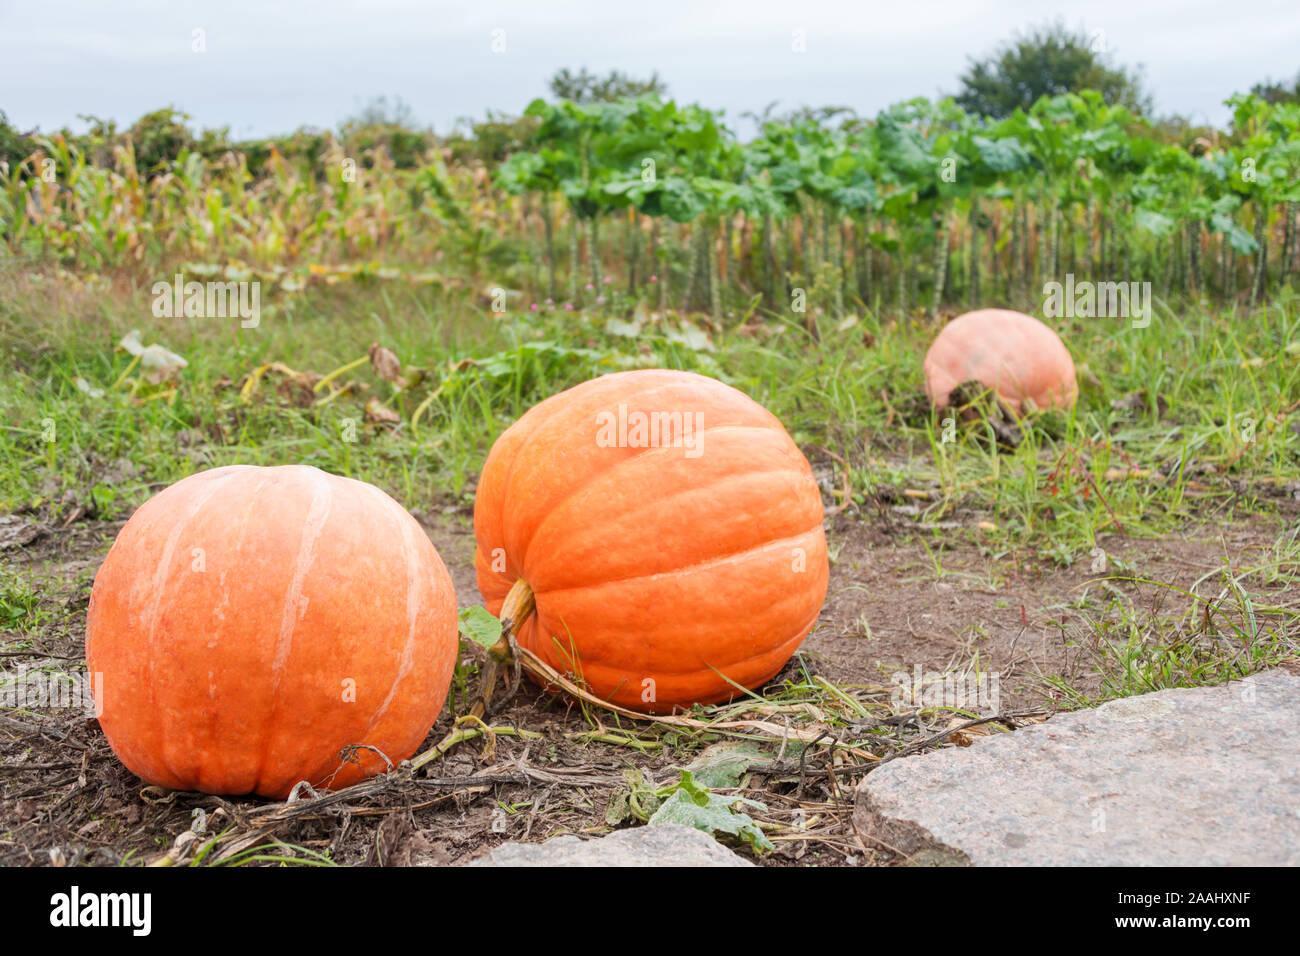 Big orange pumpkins growing in the garden. Halloween pumpkins in a vegetable garden on a farm, autumn harvest season. Organic natural food. Pumpkin Stock Photo